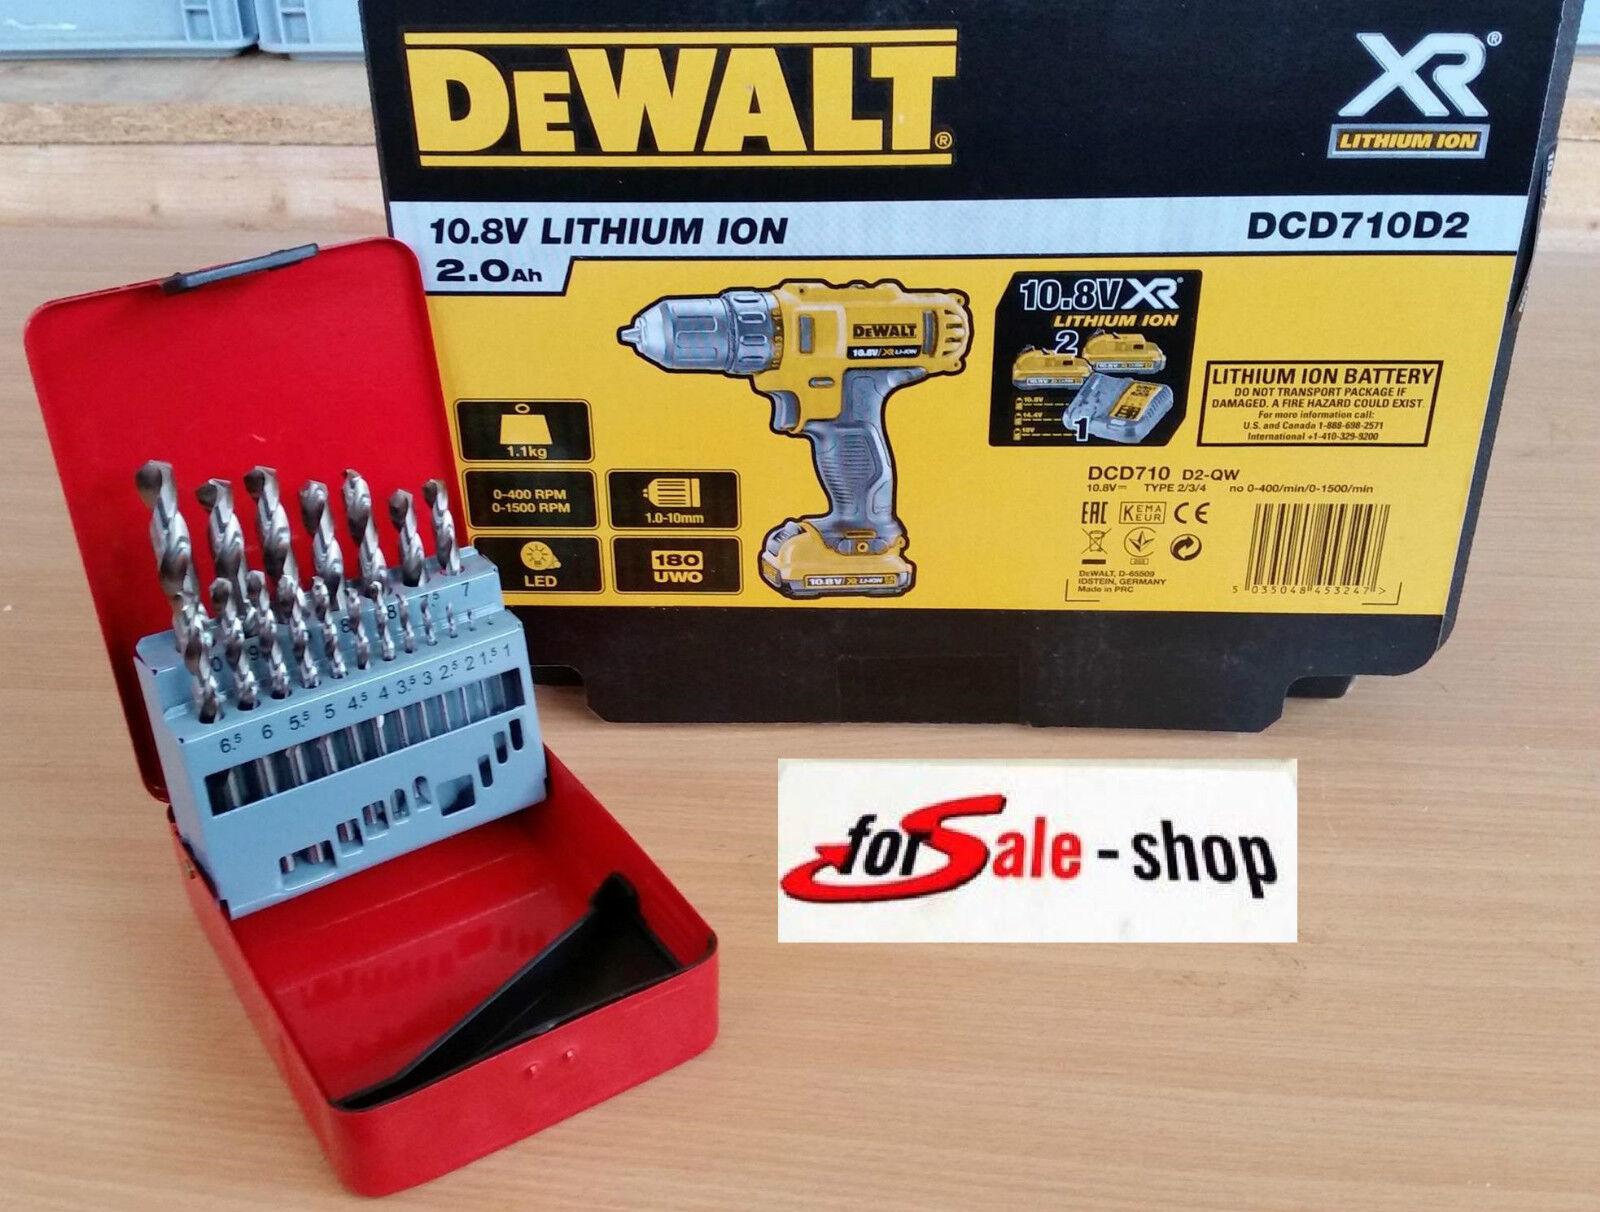 DEWALT DCD710D2 LITHIUM ION 10,8V 2,0AH BOHRSCHRAUBER + GRATIS BOHRSET 1 - 10